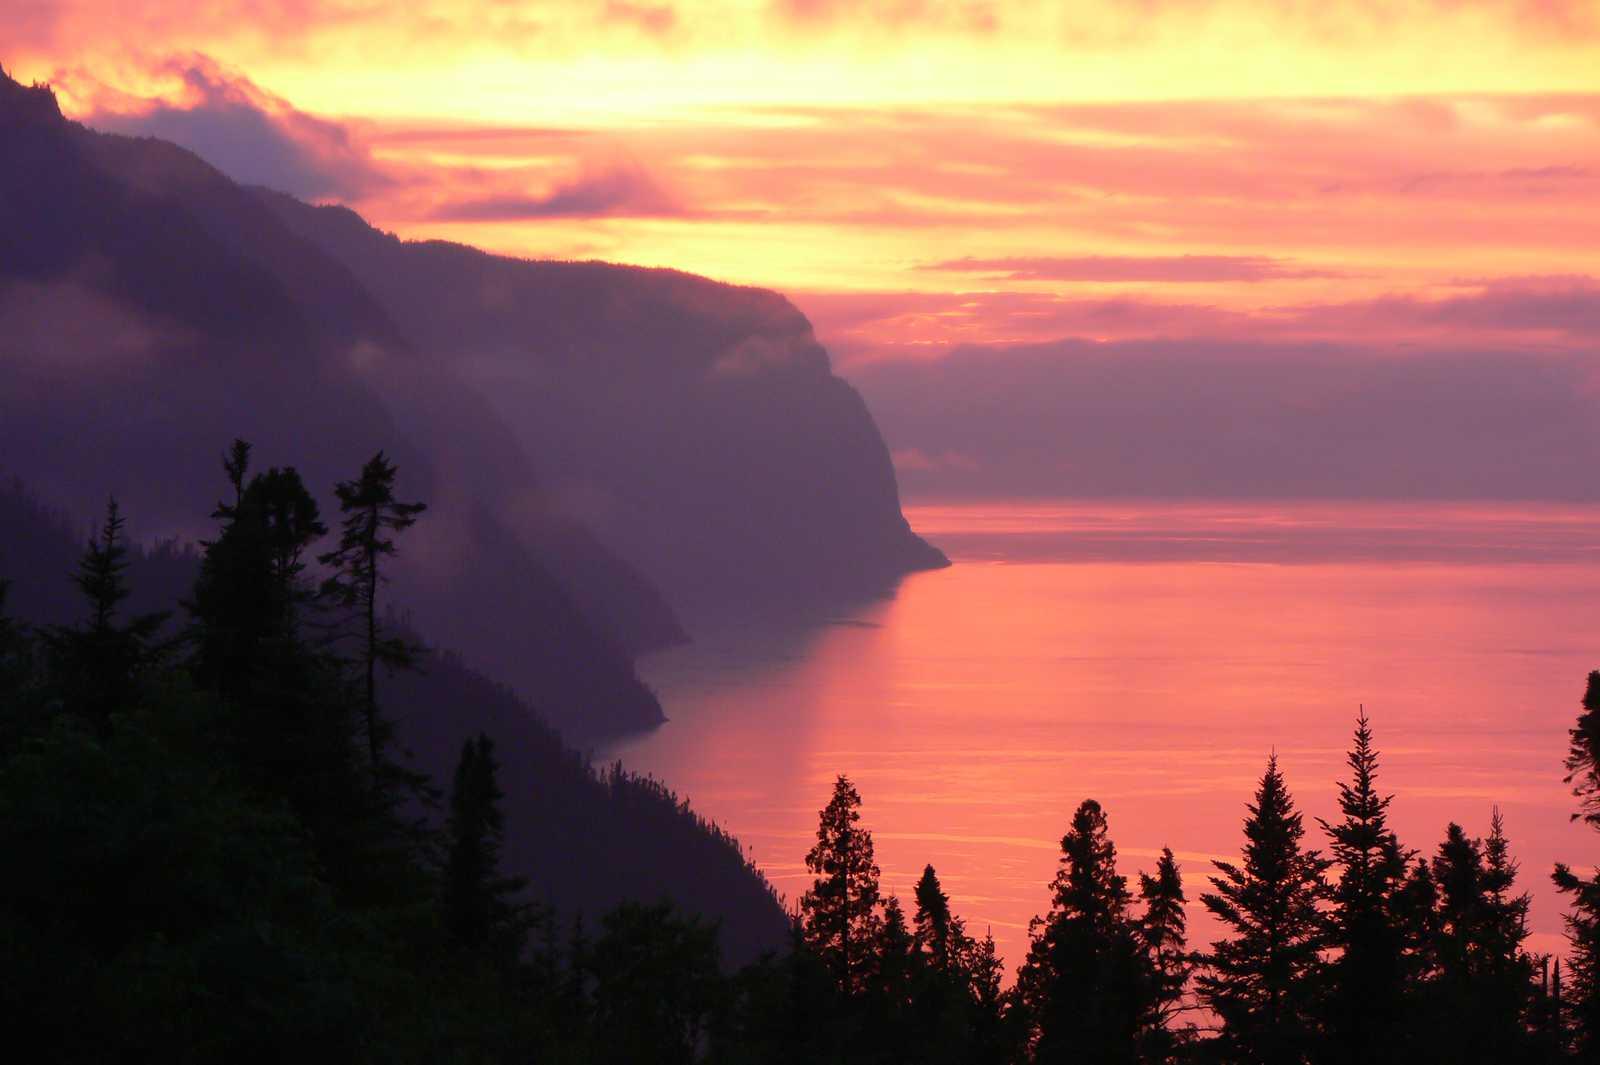 Der Fjord-du-Saguenay bei Sonnenuntergang